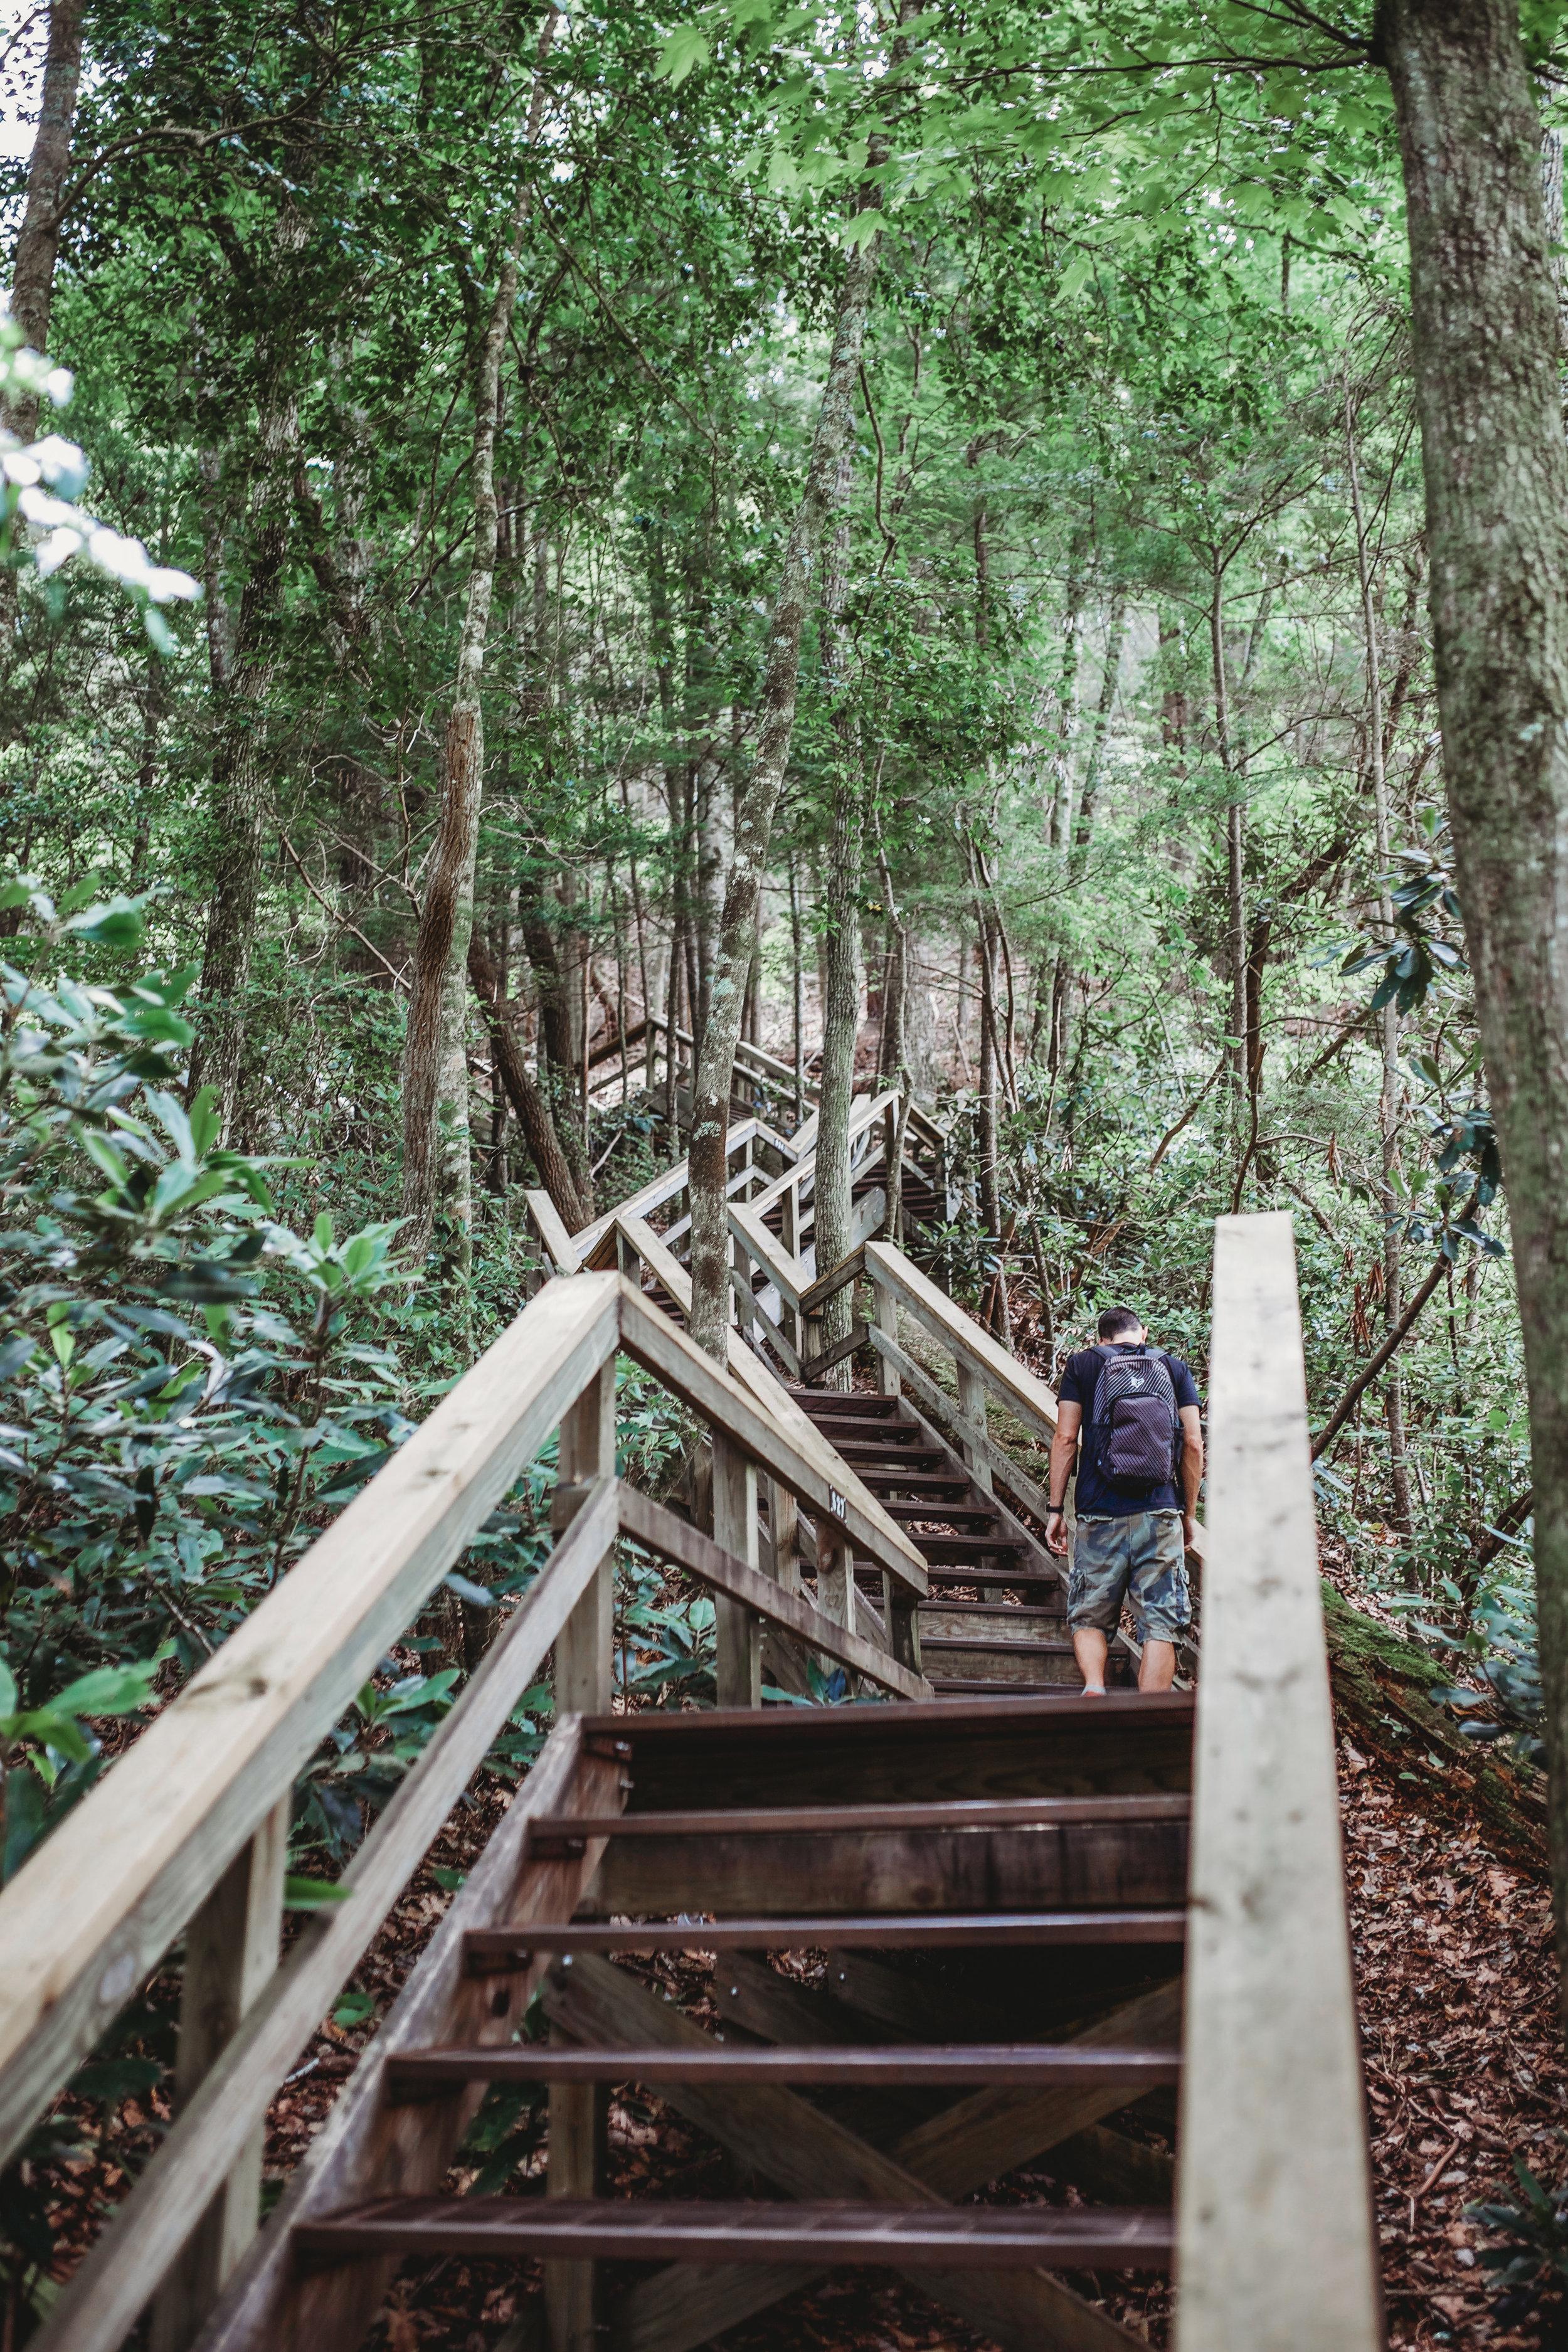 Sooo many stairs!